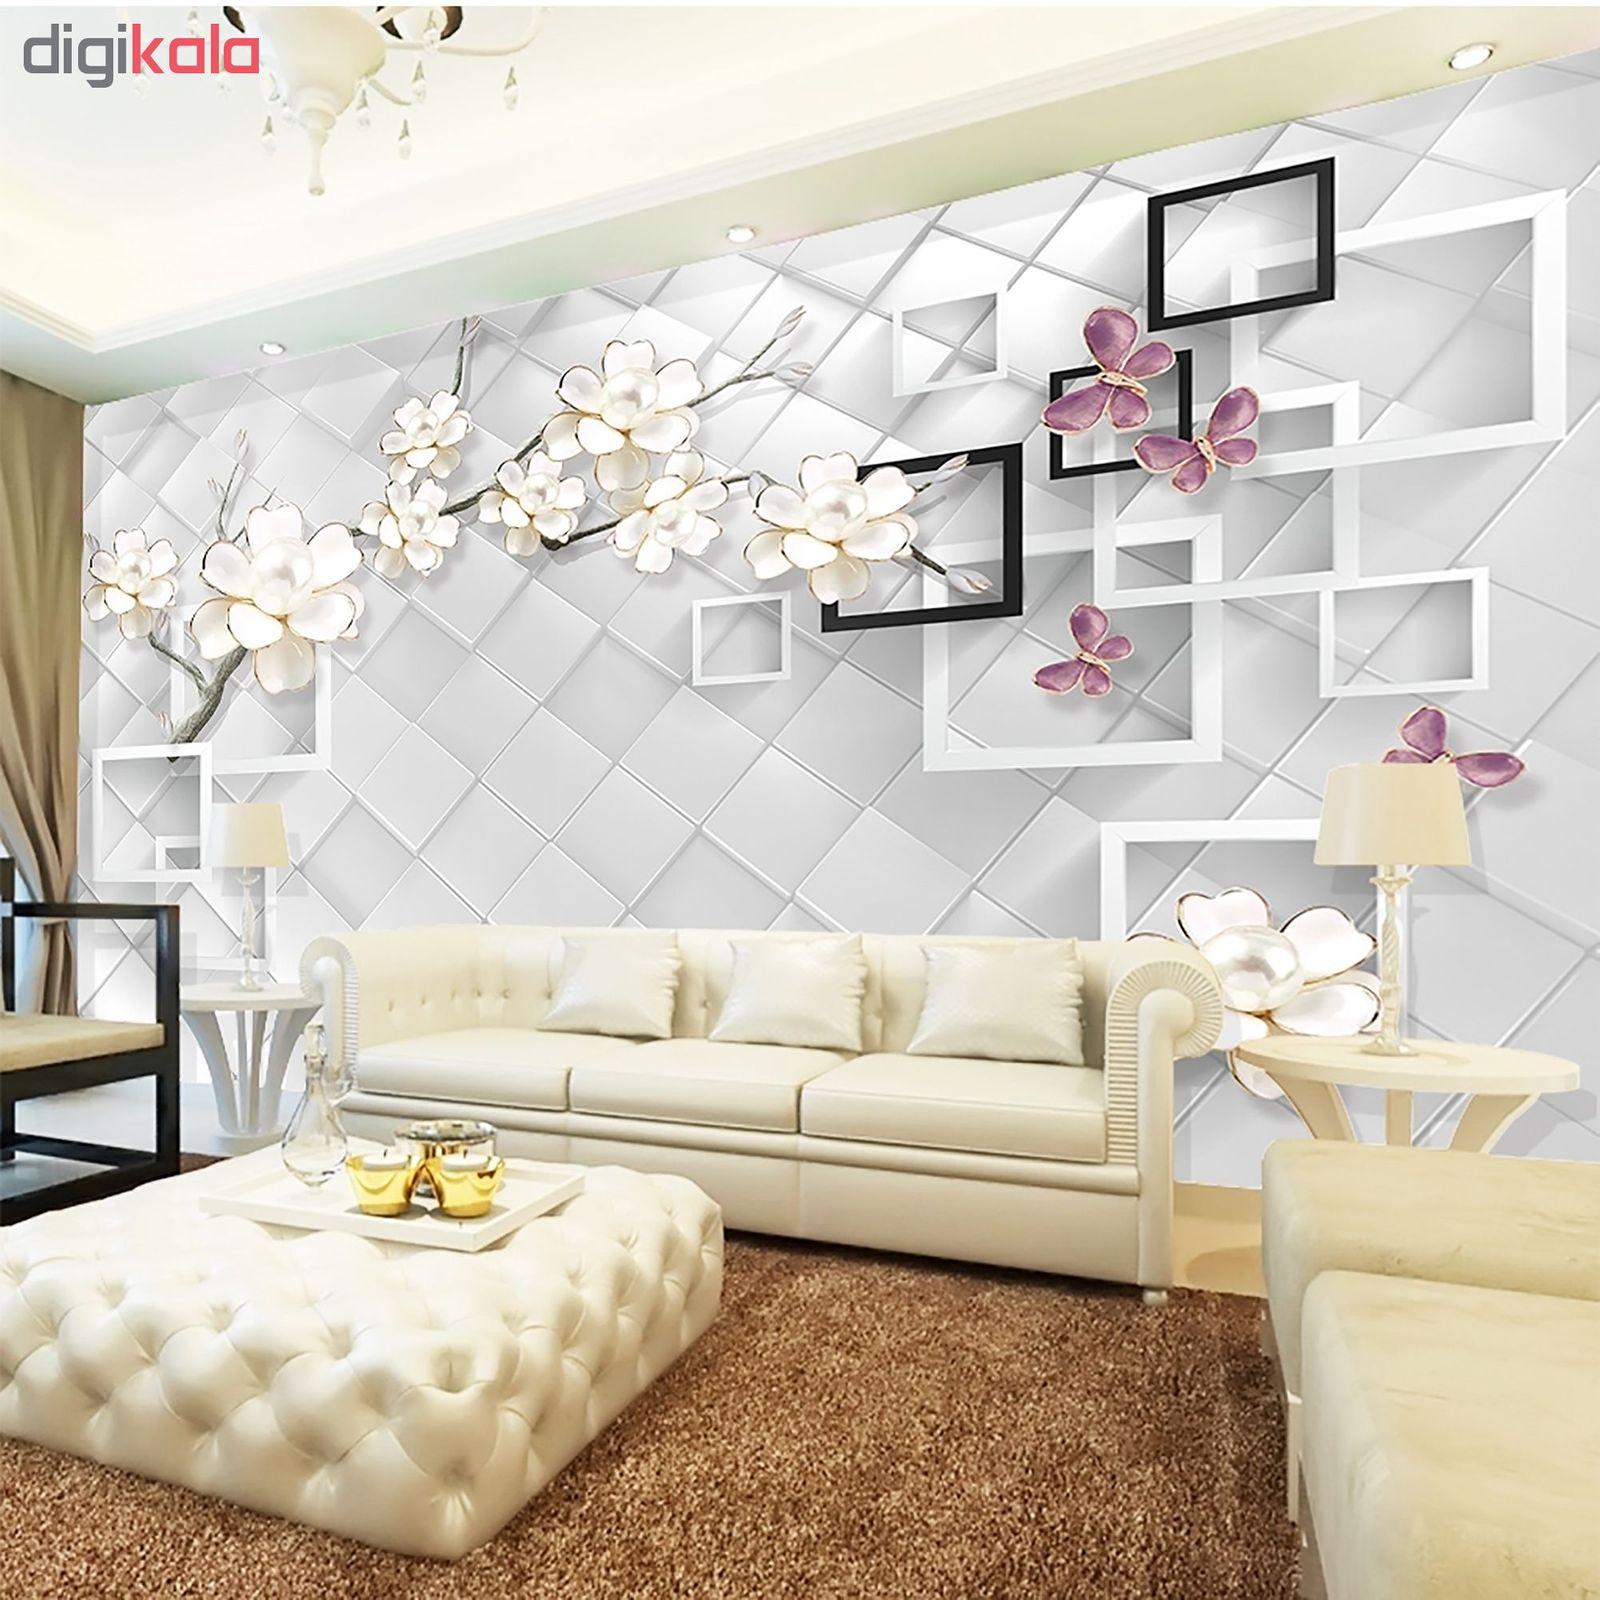 پوستر دیواری سه بعدی کد 16416043 main 1 2